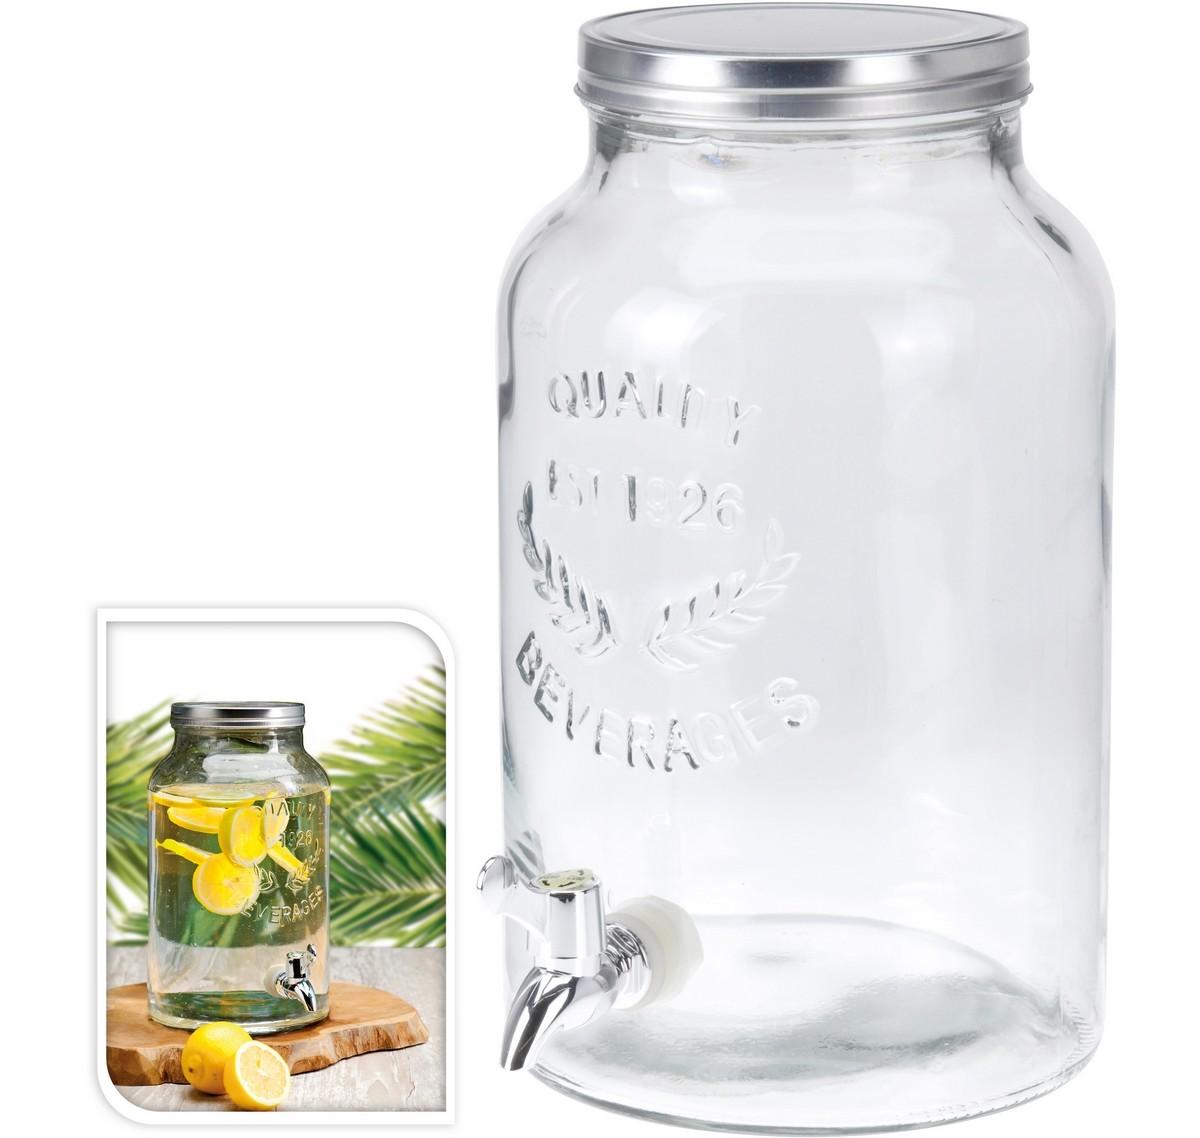 Sapdispenser Quality Beverages 55 liter